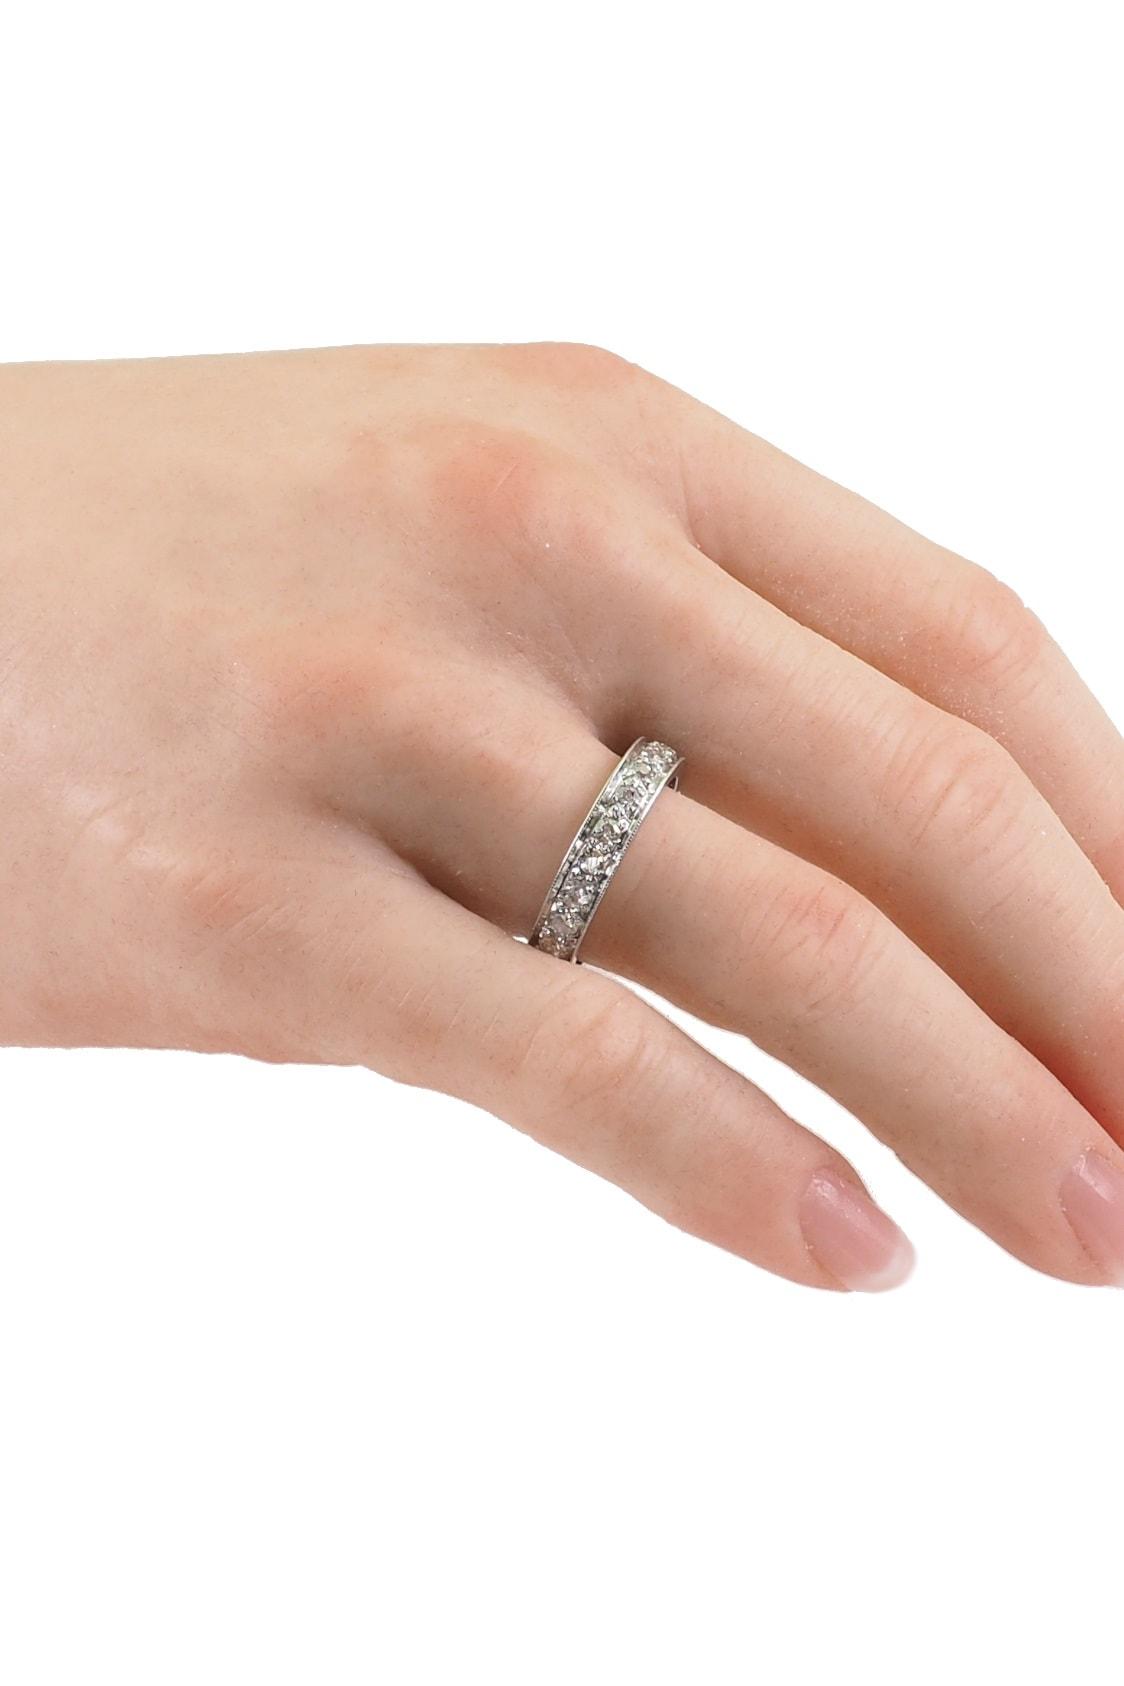 0159-Ringhand-Eternityring